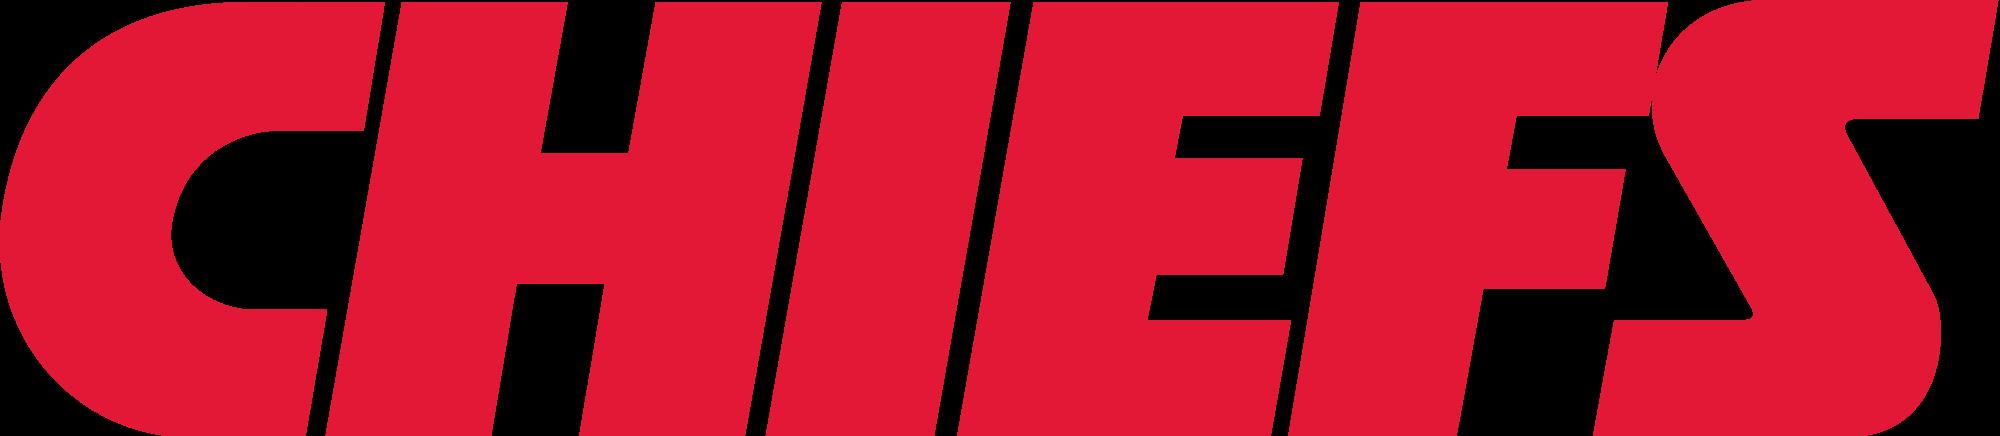 2000x436 Magnificent Kc Chiefs Logo 26 98725 Coloring Pages